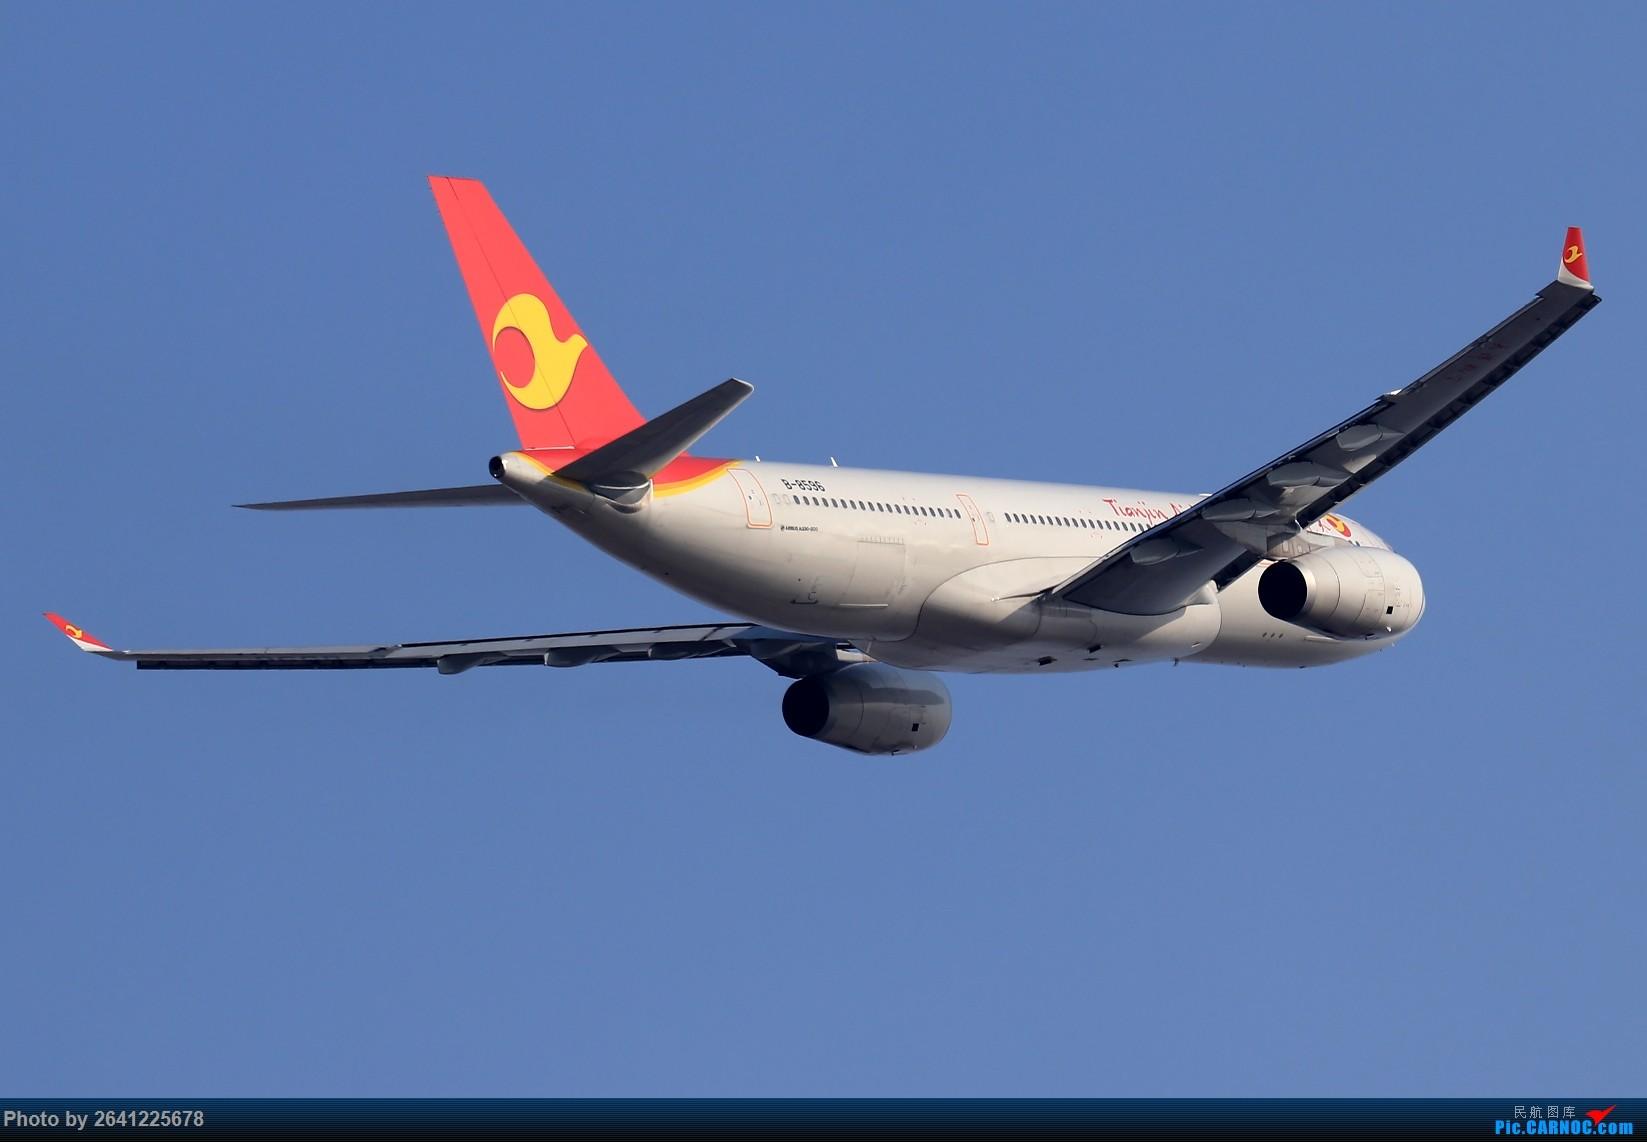 Re:[原创]【TSN】天津滨海国际机场半日游(按注册号1~9发图) AIRBUS A330-200 B-8596 中国天津滨海国际机场